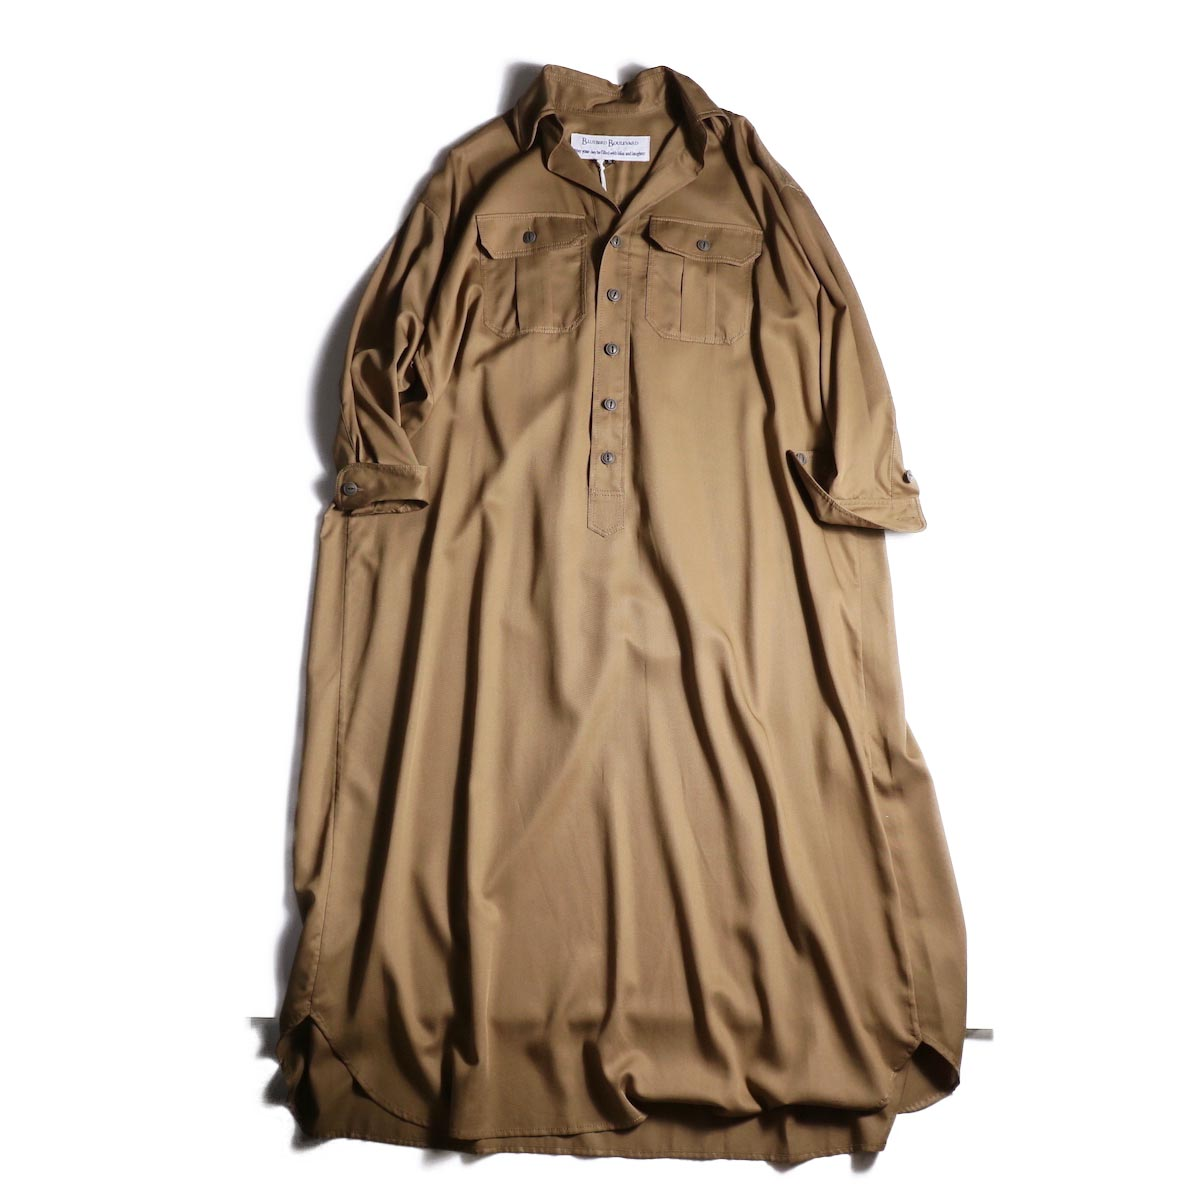 BLUEBIRD BOULEVARD / ソフトツイルシャツドレス (Camel)